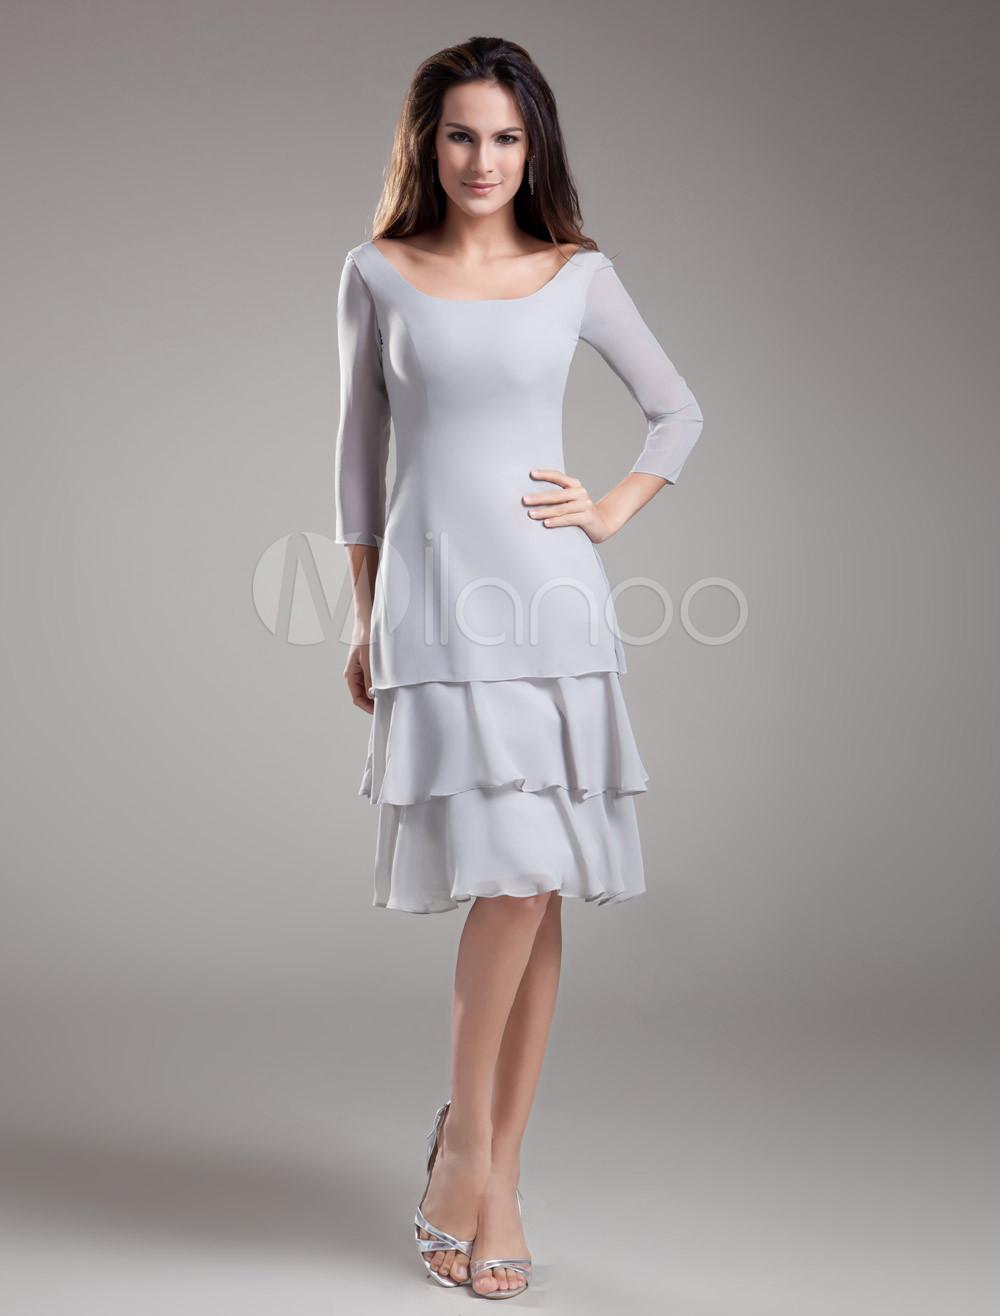 Elegant Sheath Silver Chiffon Tiered Off-The-Shoulder Knee-Length Bridesmaid Dress For Wedding